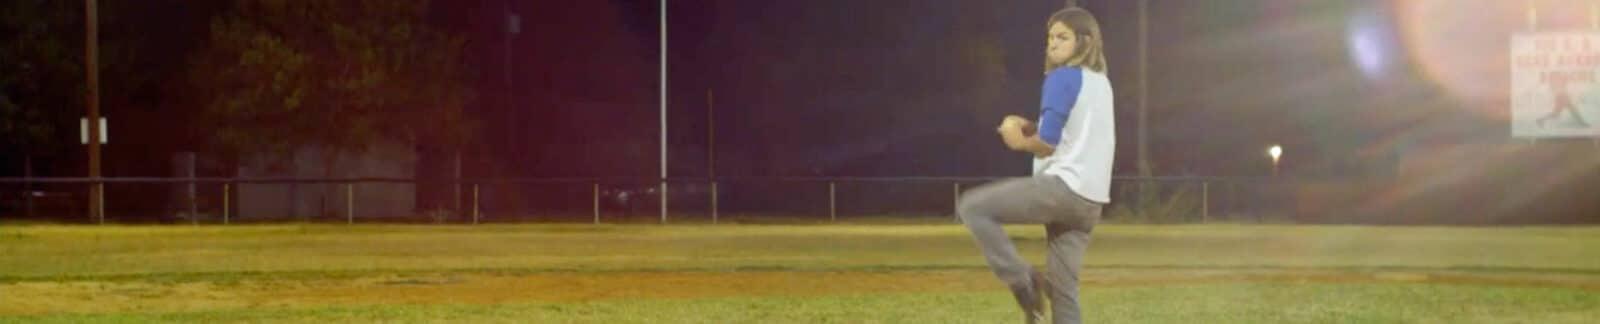 The Age of Reason baseball movie header